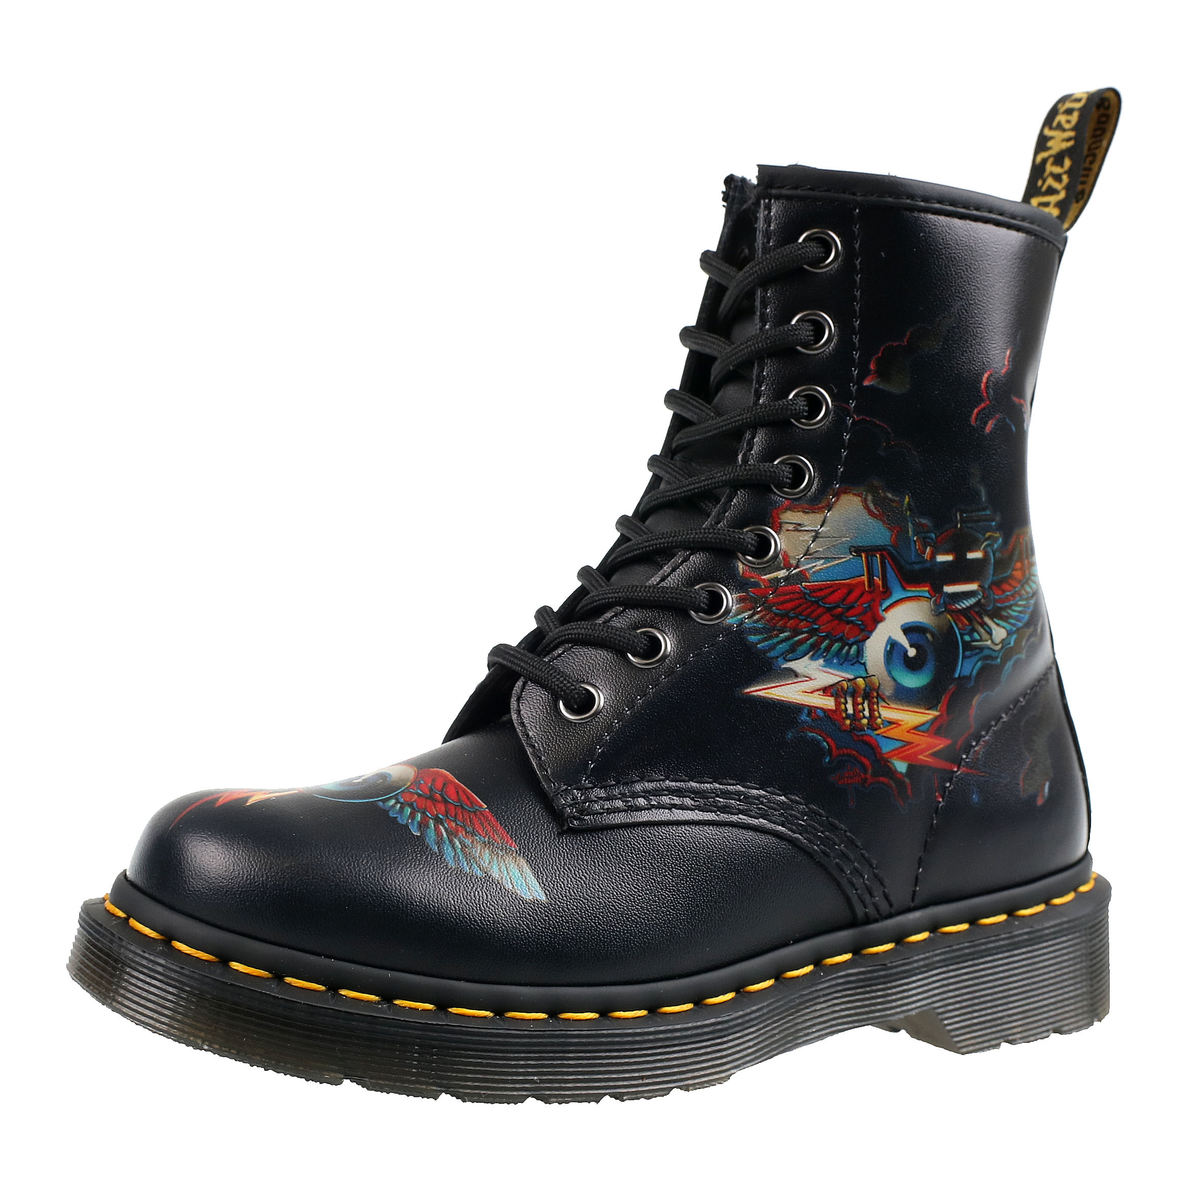 953fbc5b15 topánky DR.MARTENS - 8 dierkové - RICK GRIFFIN - RG EYE MULTI ...